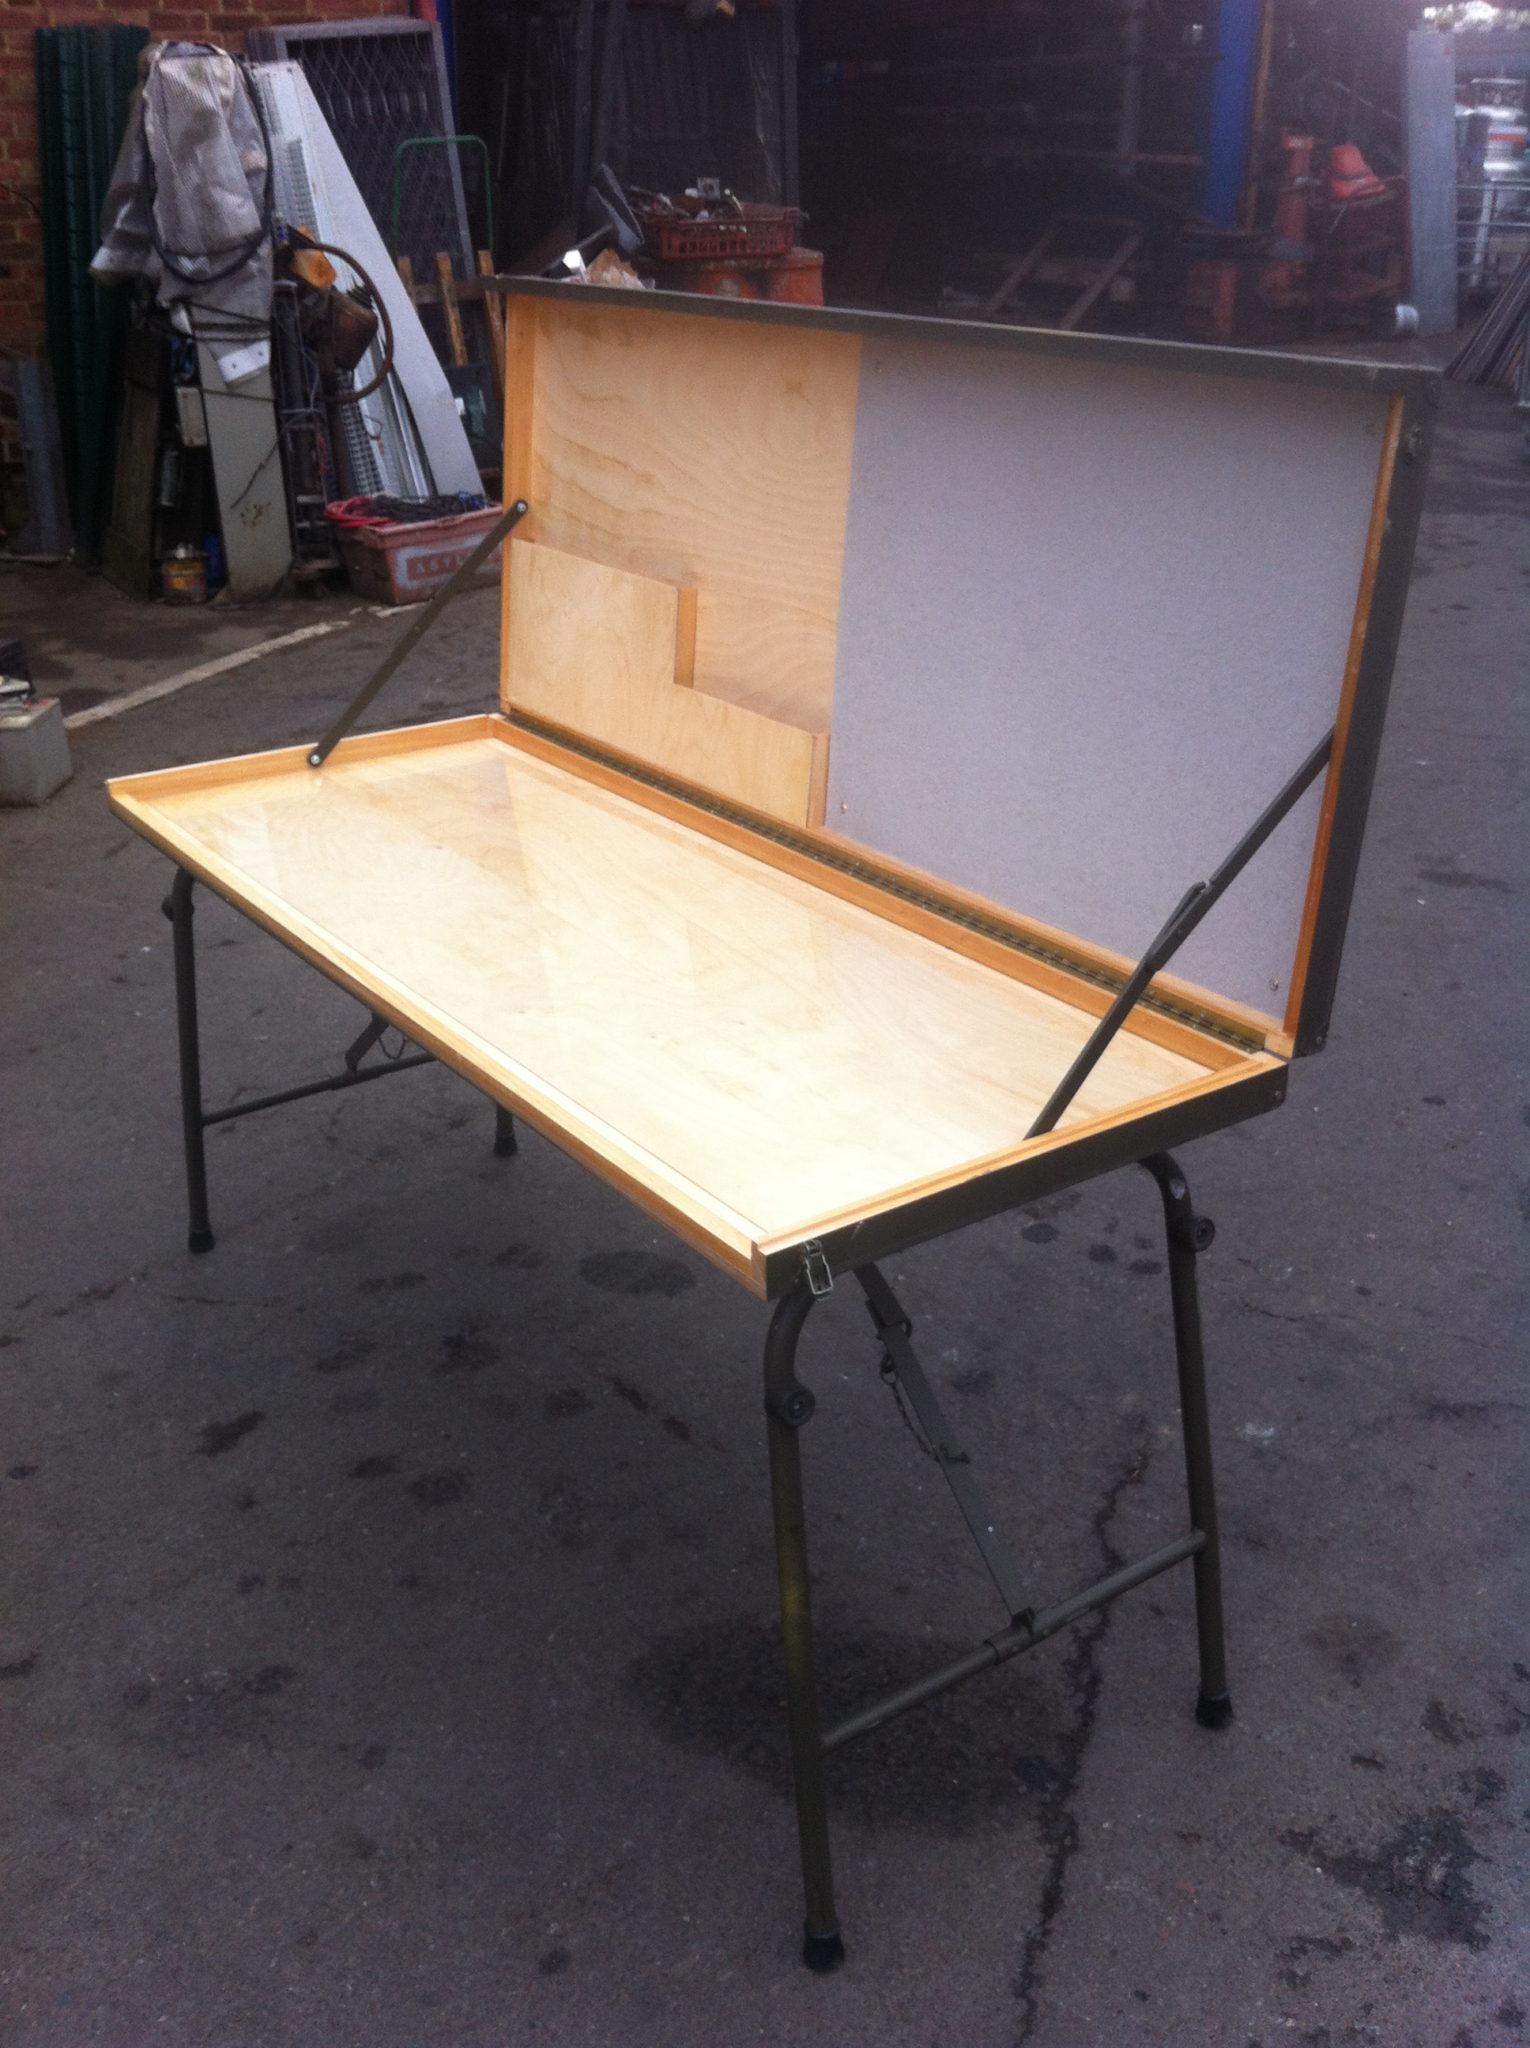 Map Table Folding - Folding Map Table